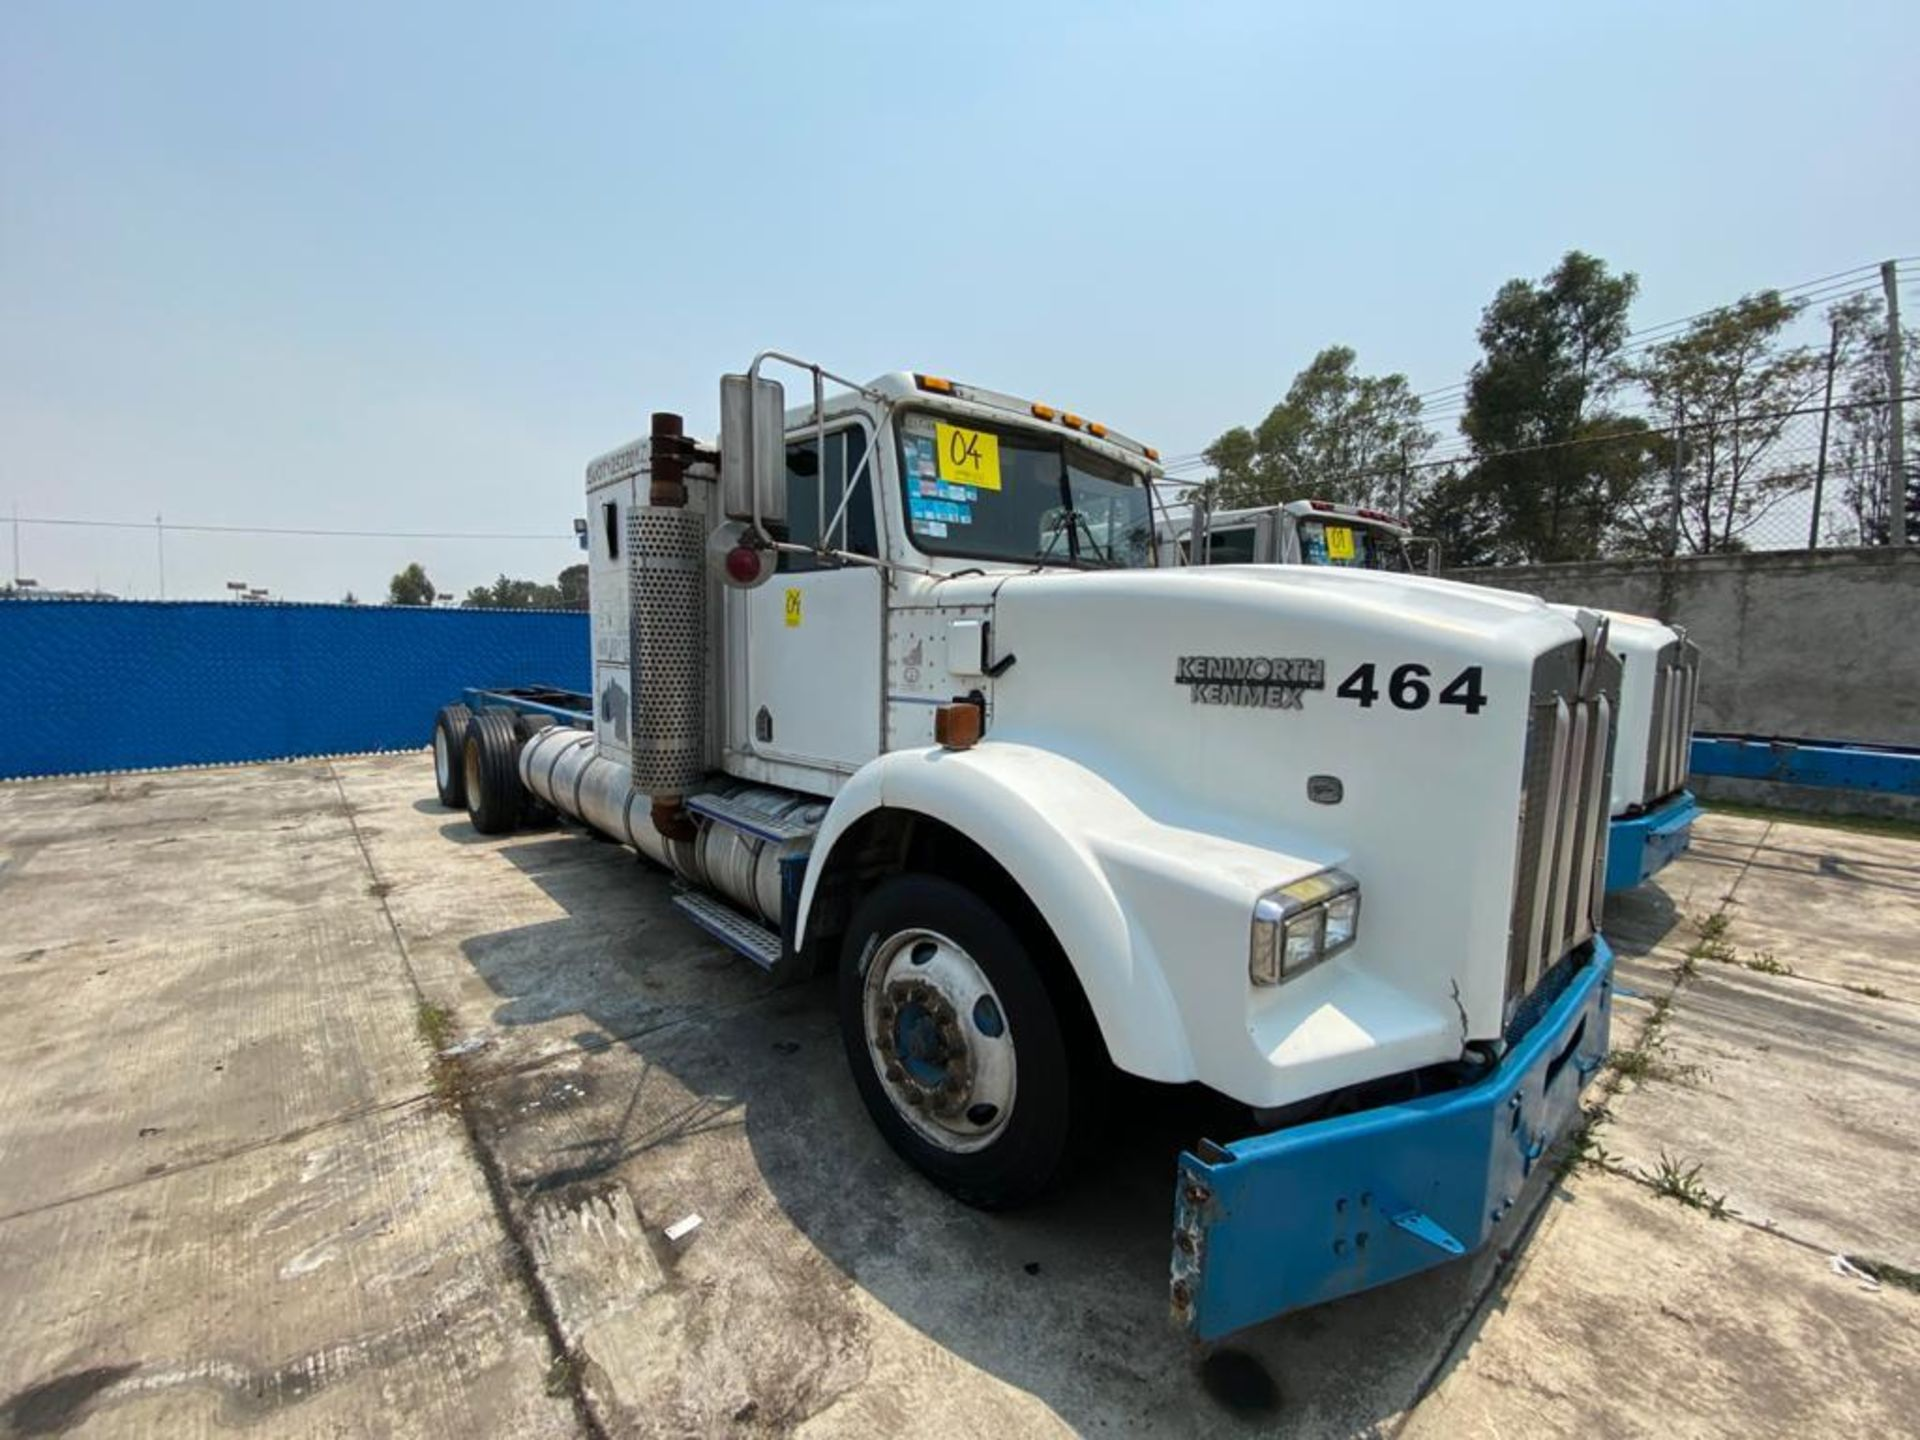 1999 Kenworth Sleeper truck tractor, standard transmission of 18 speeds - Image 3 of 70